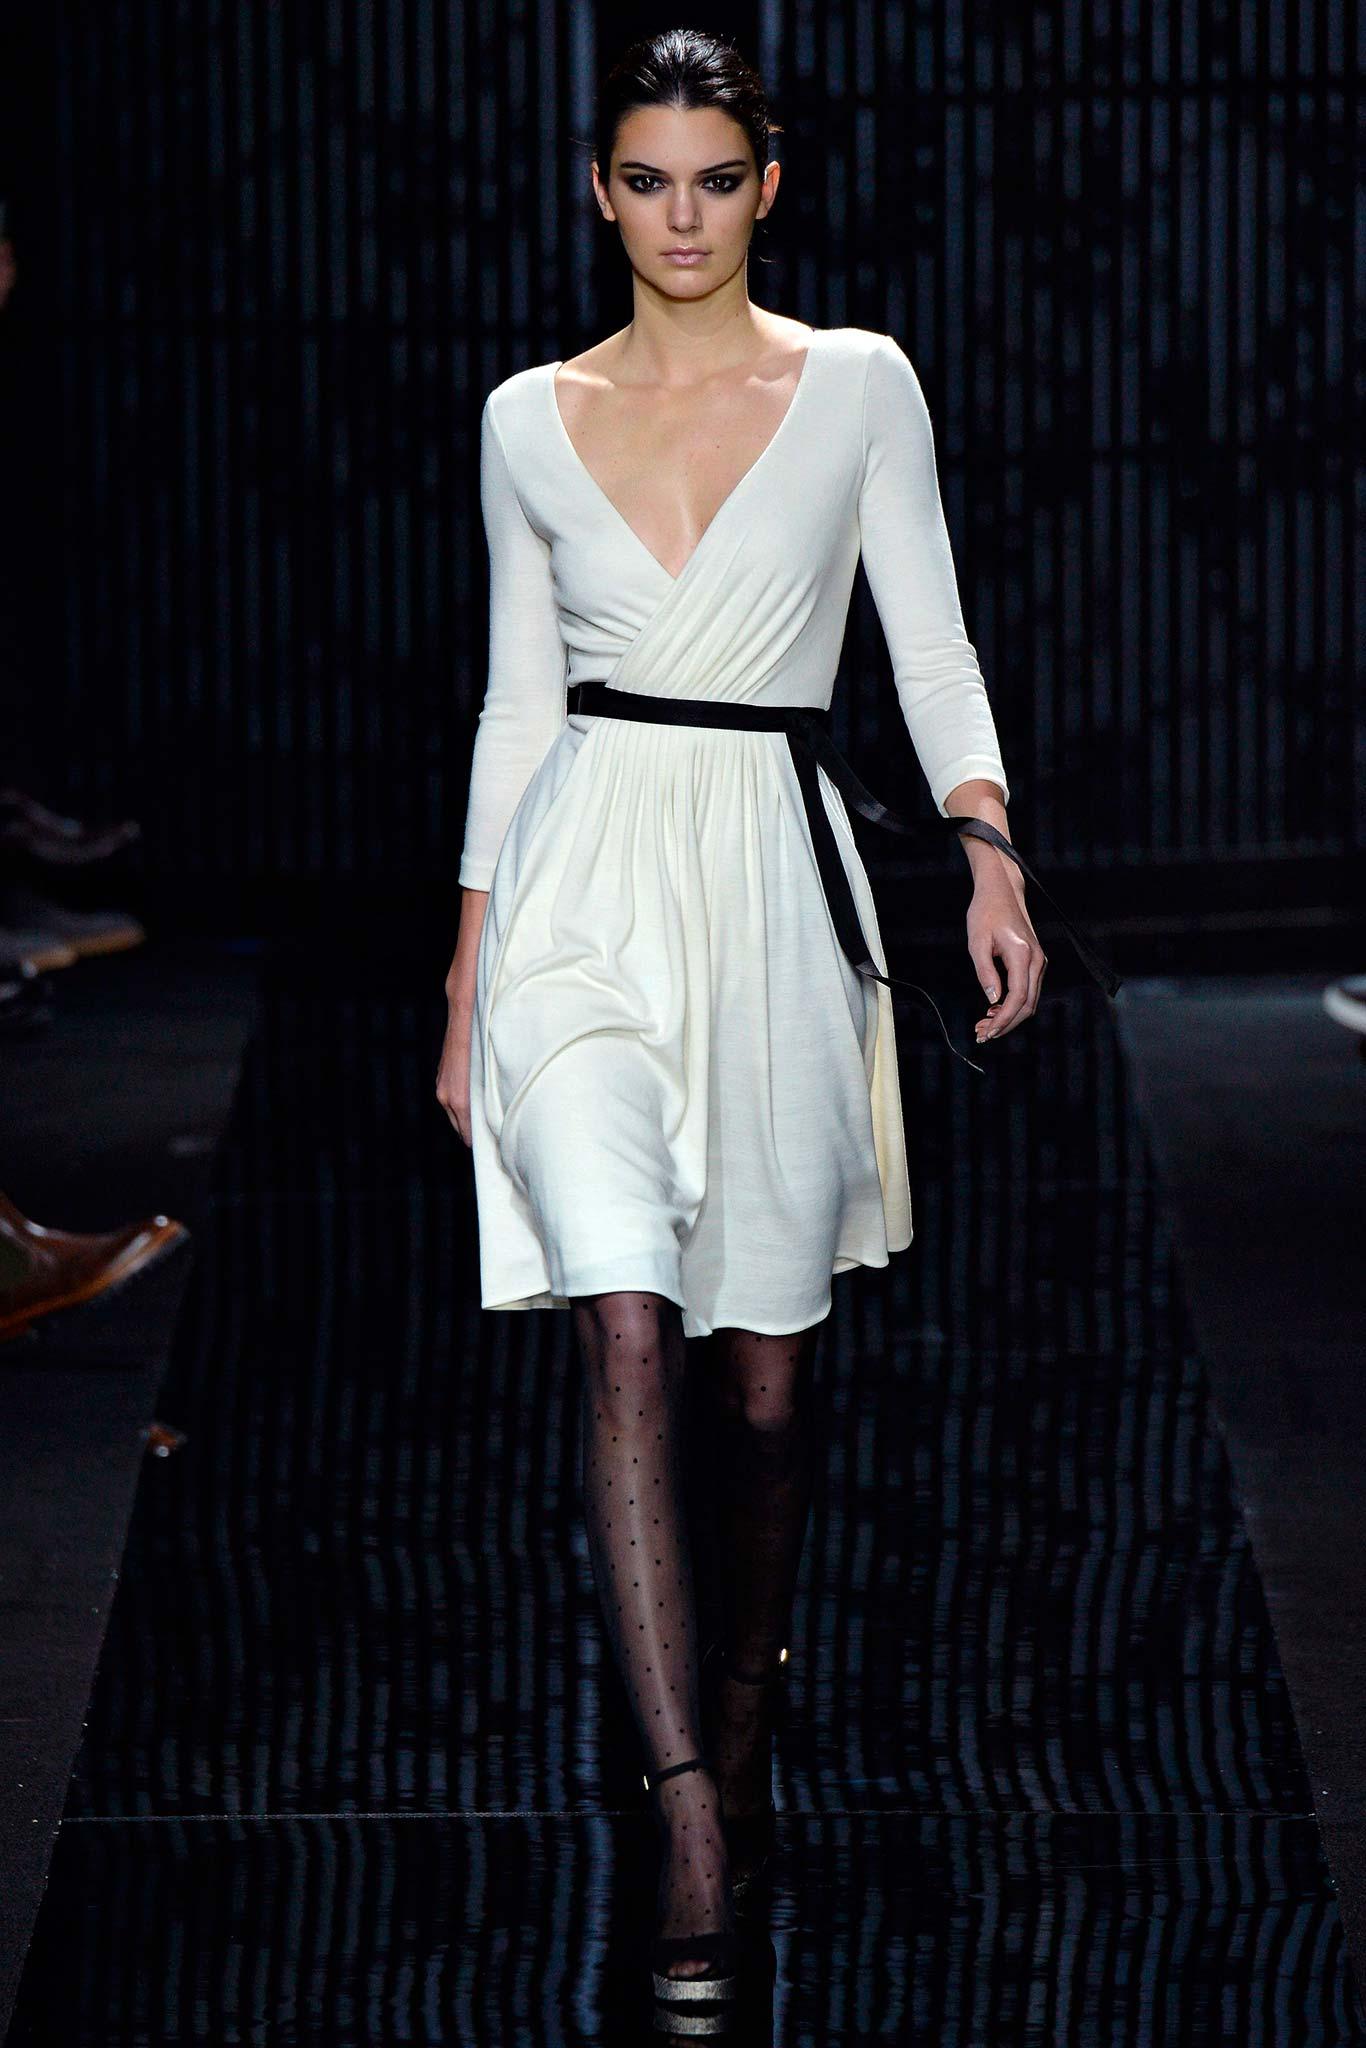 Diane von Furstenberg Fall 2015 Ready-to-Wear Look 1 Photo: Yannis Vlamos / Indigitalimages.com | Style.com | Fall 2015 RTW Runway Looks